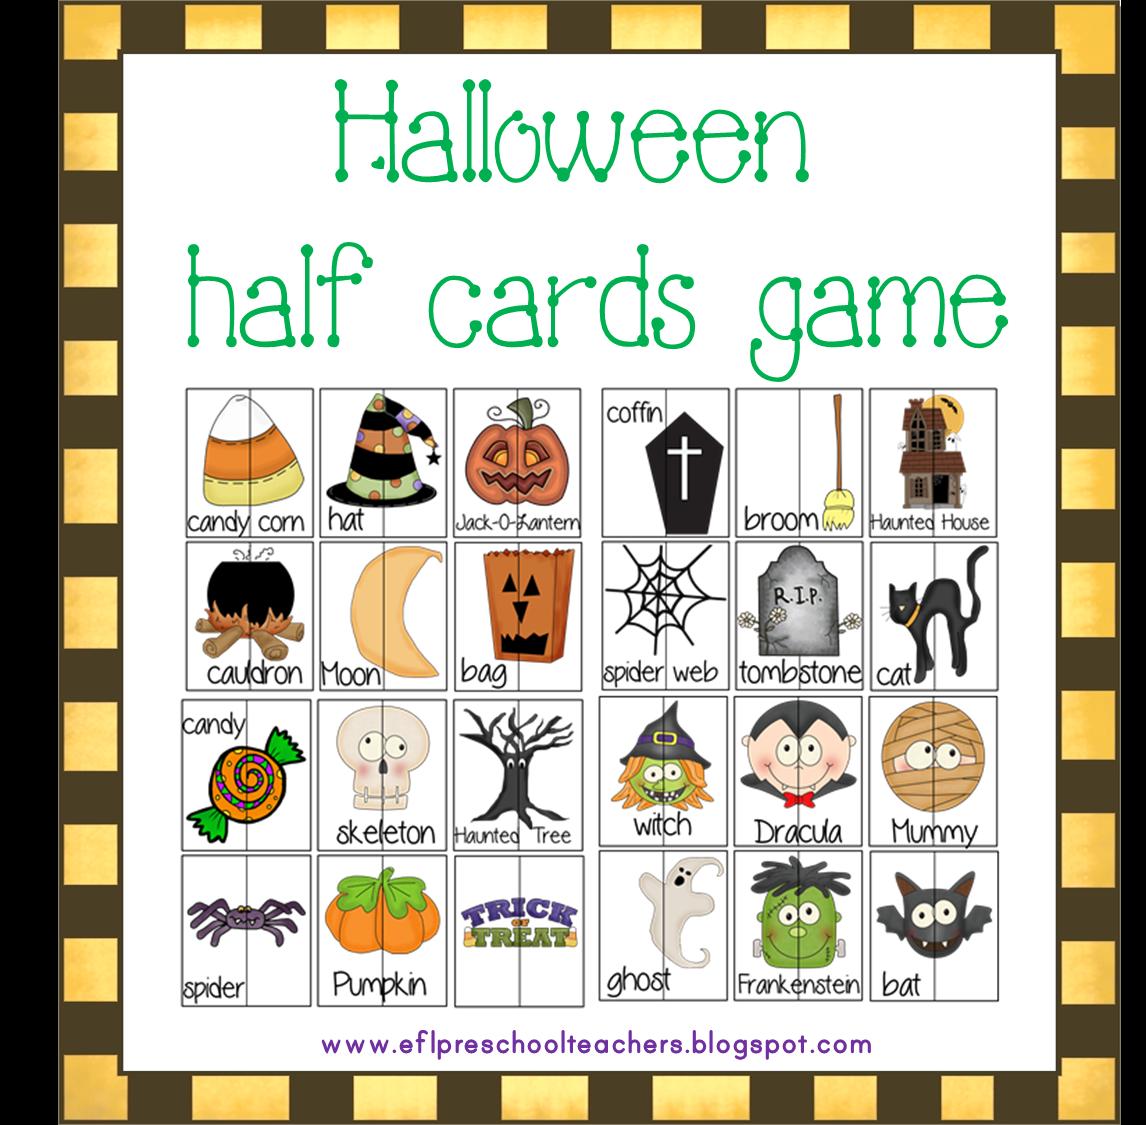 Esl Efl Preschool Teachers Halloween